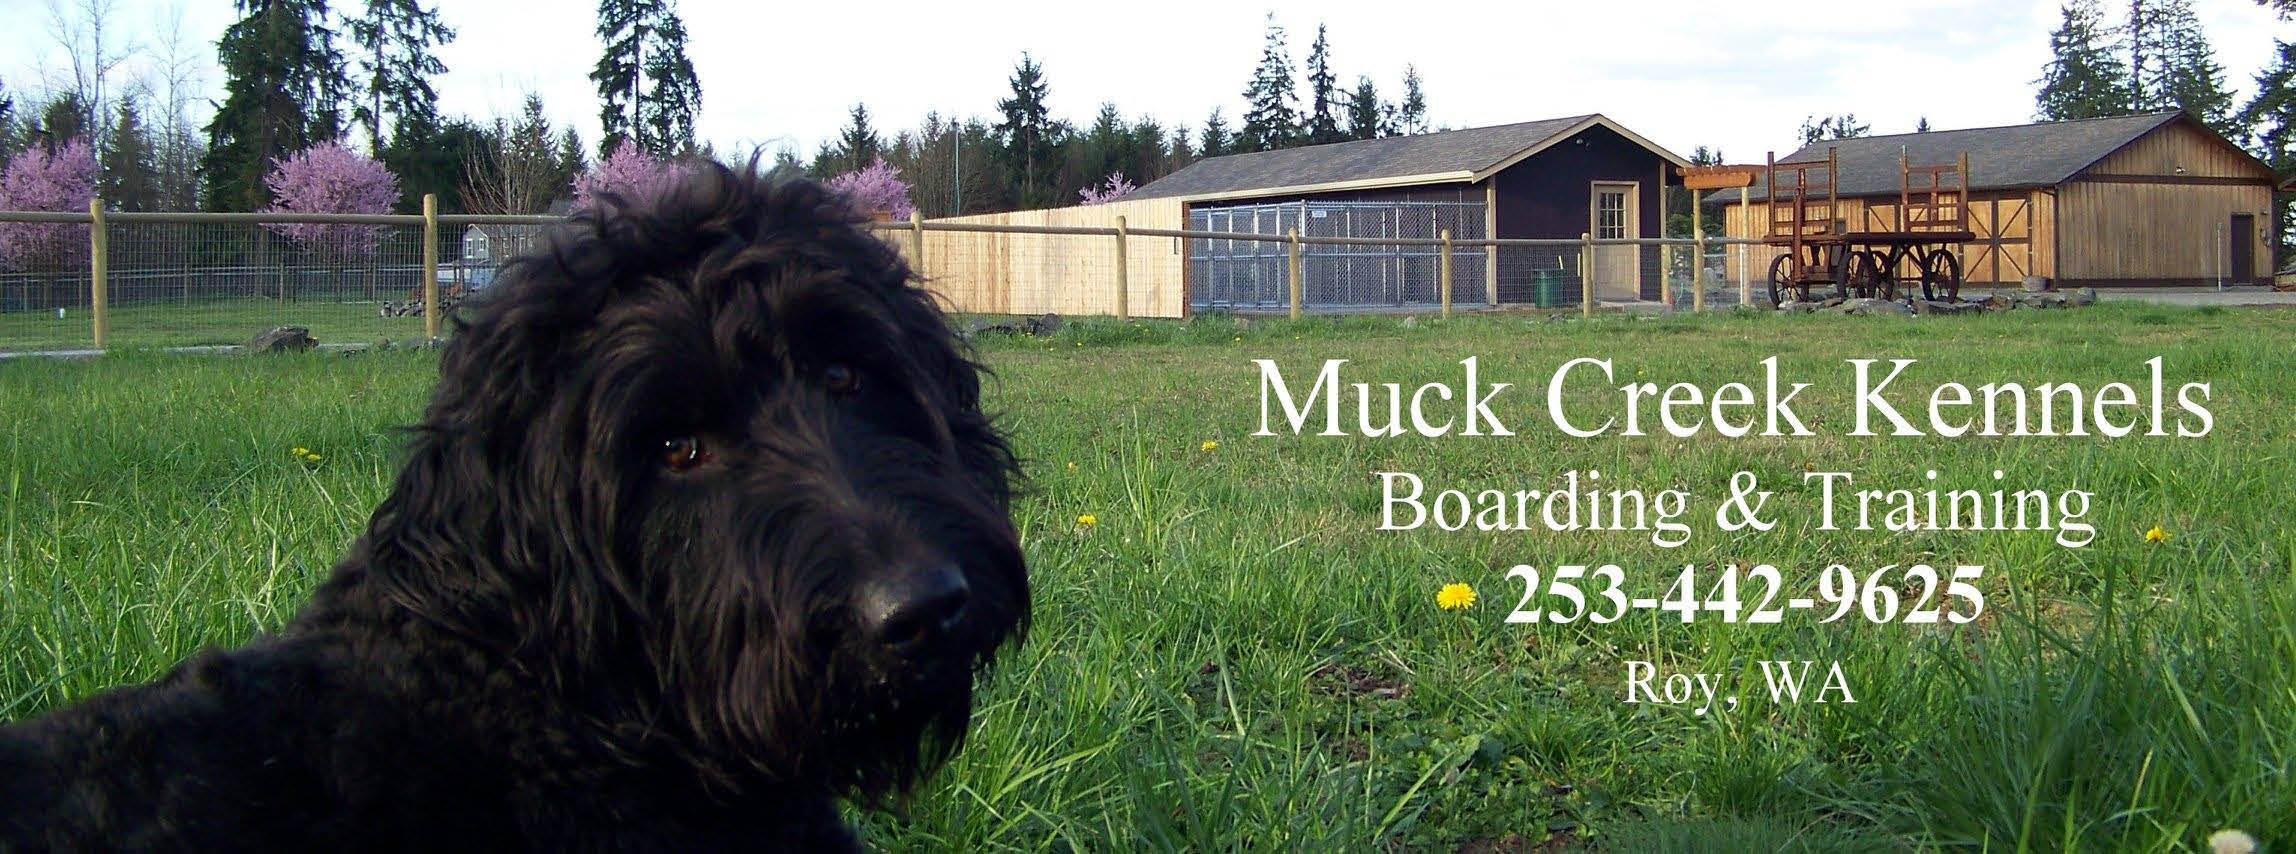 Muck Creek Kennels - dog boarding - dog training - dog obedience boot camp - Roy, Washington